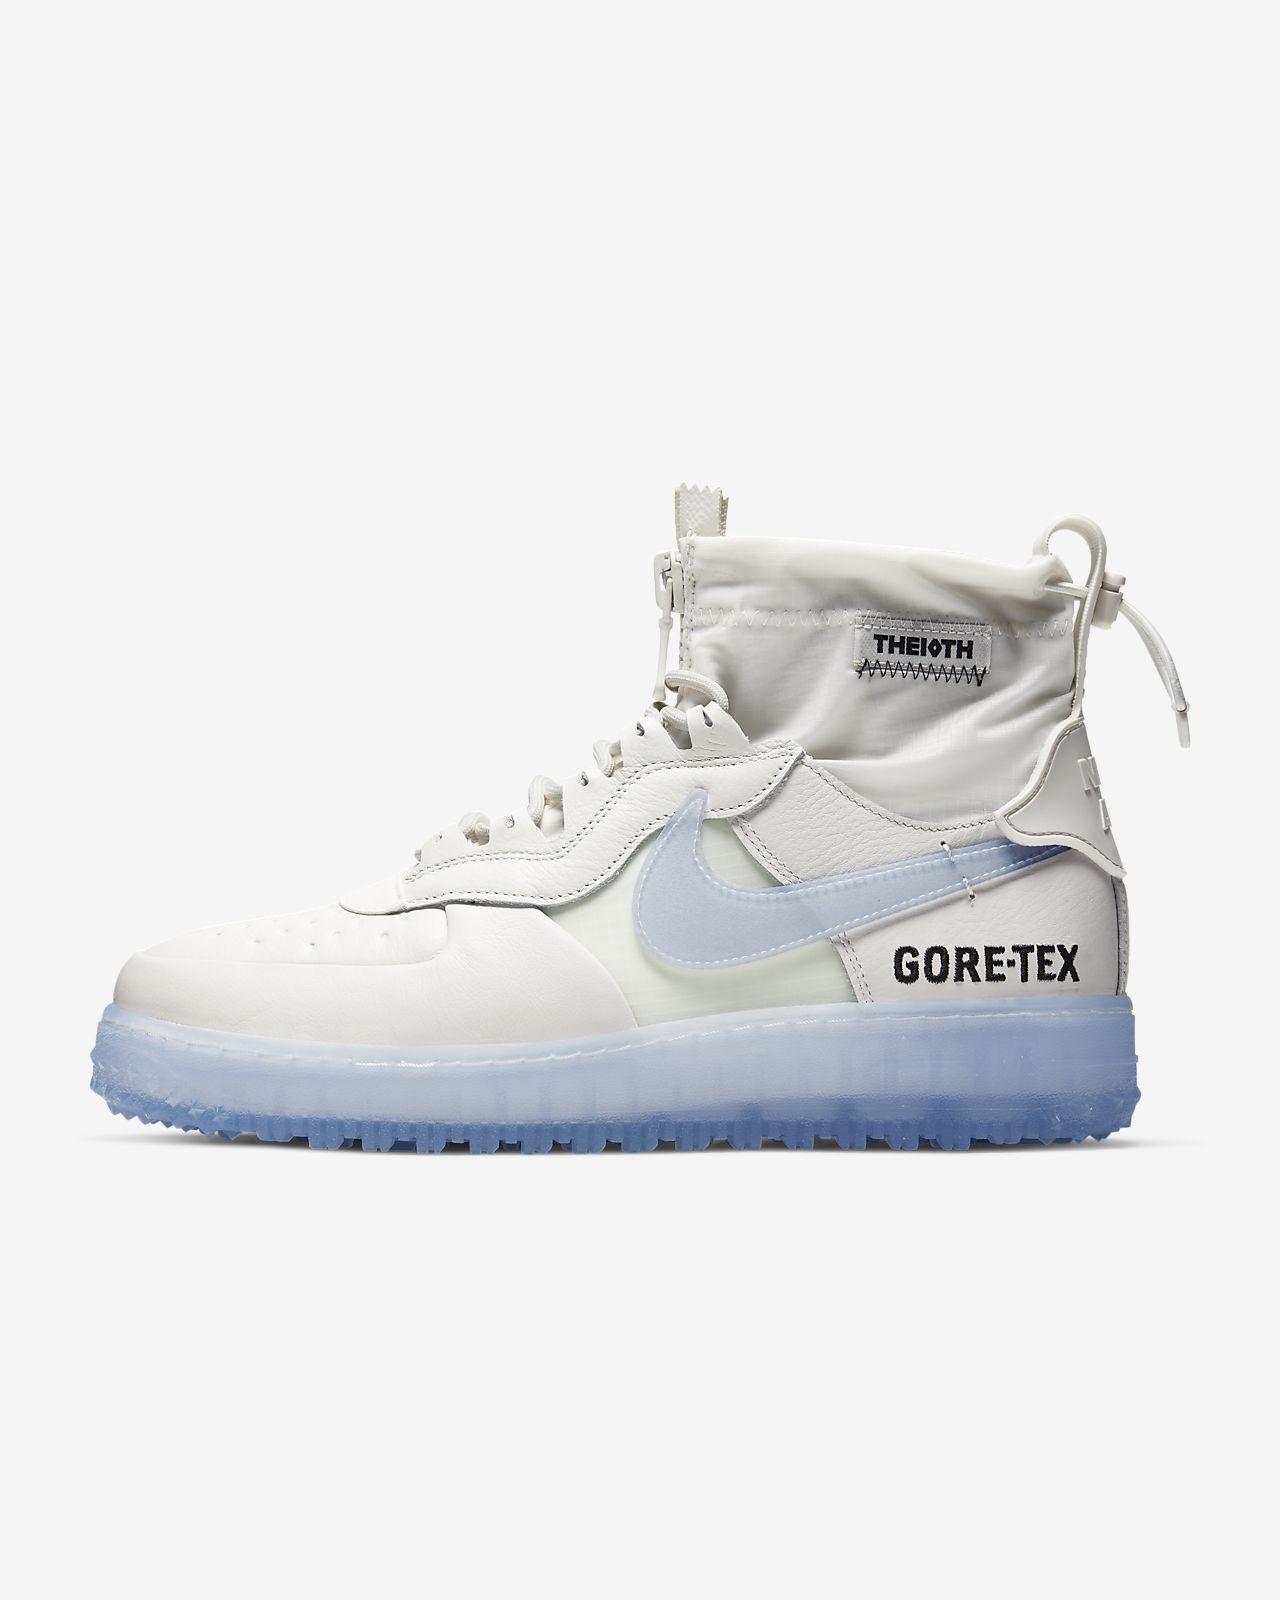 Nike Air Force 1 GORE TEX ® Shoe. Nike AT